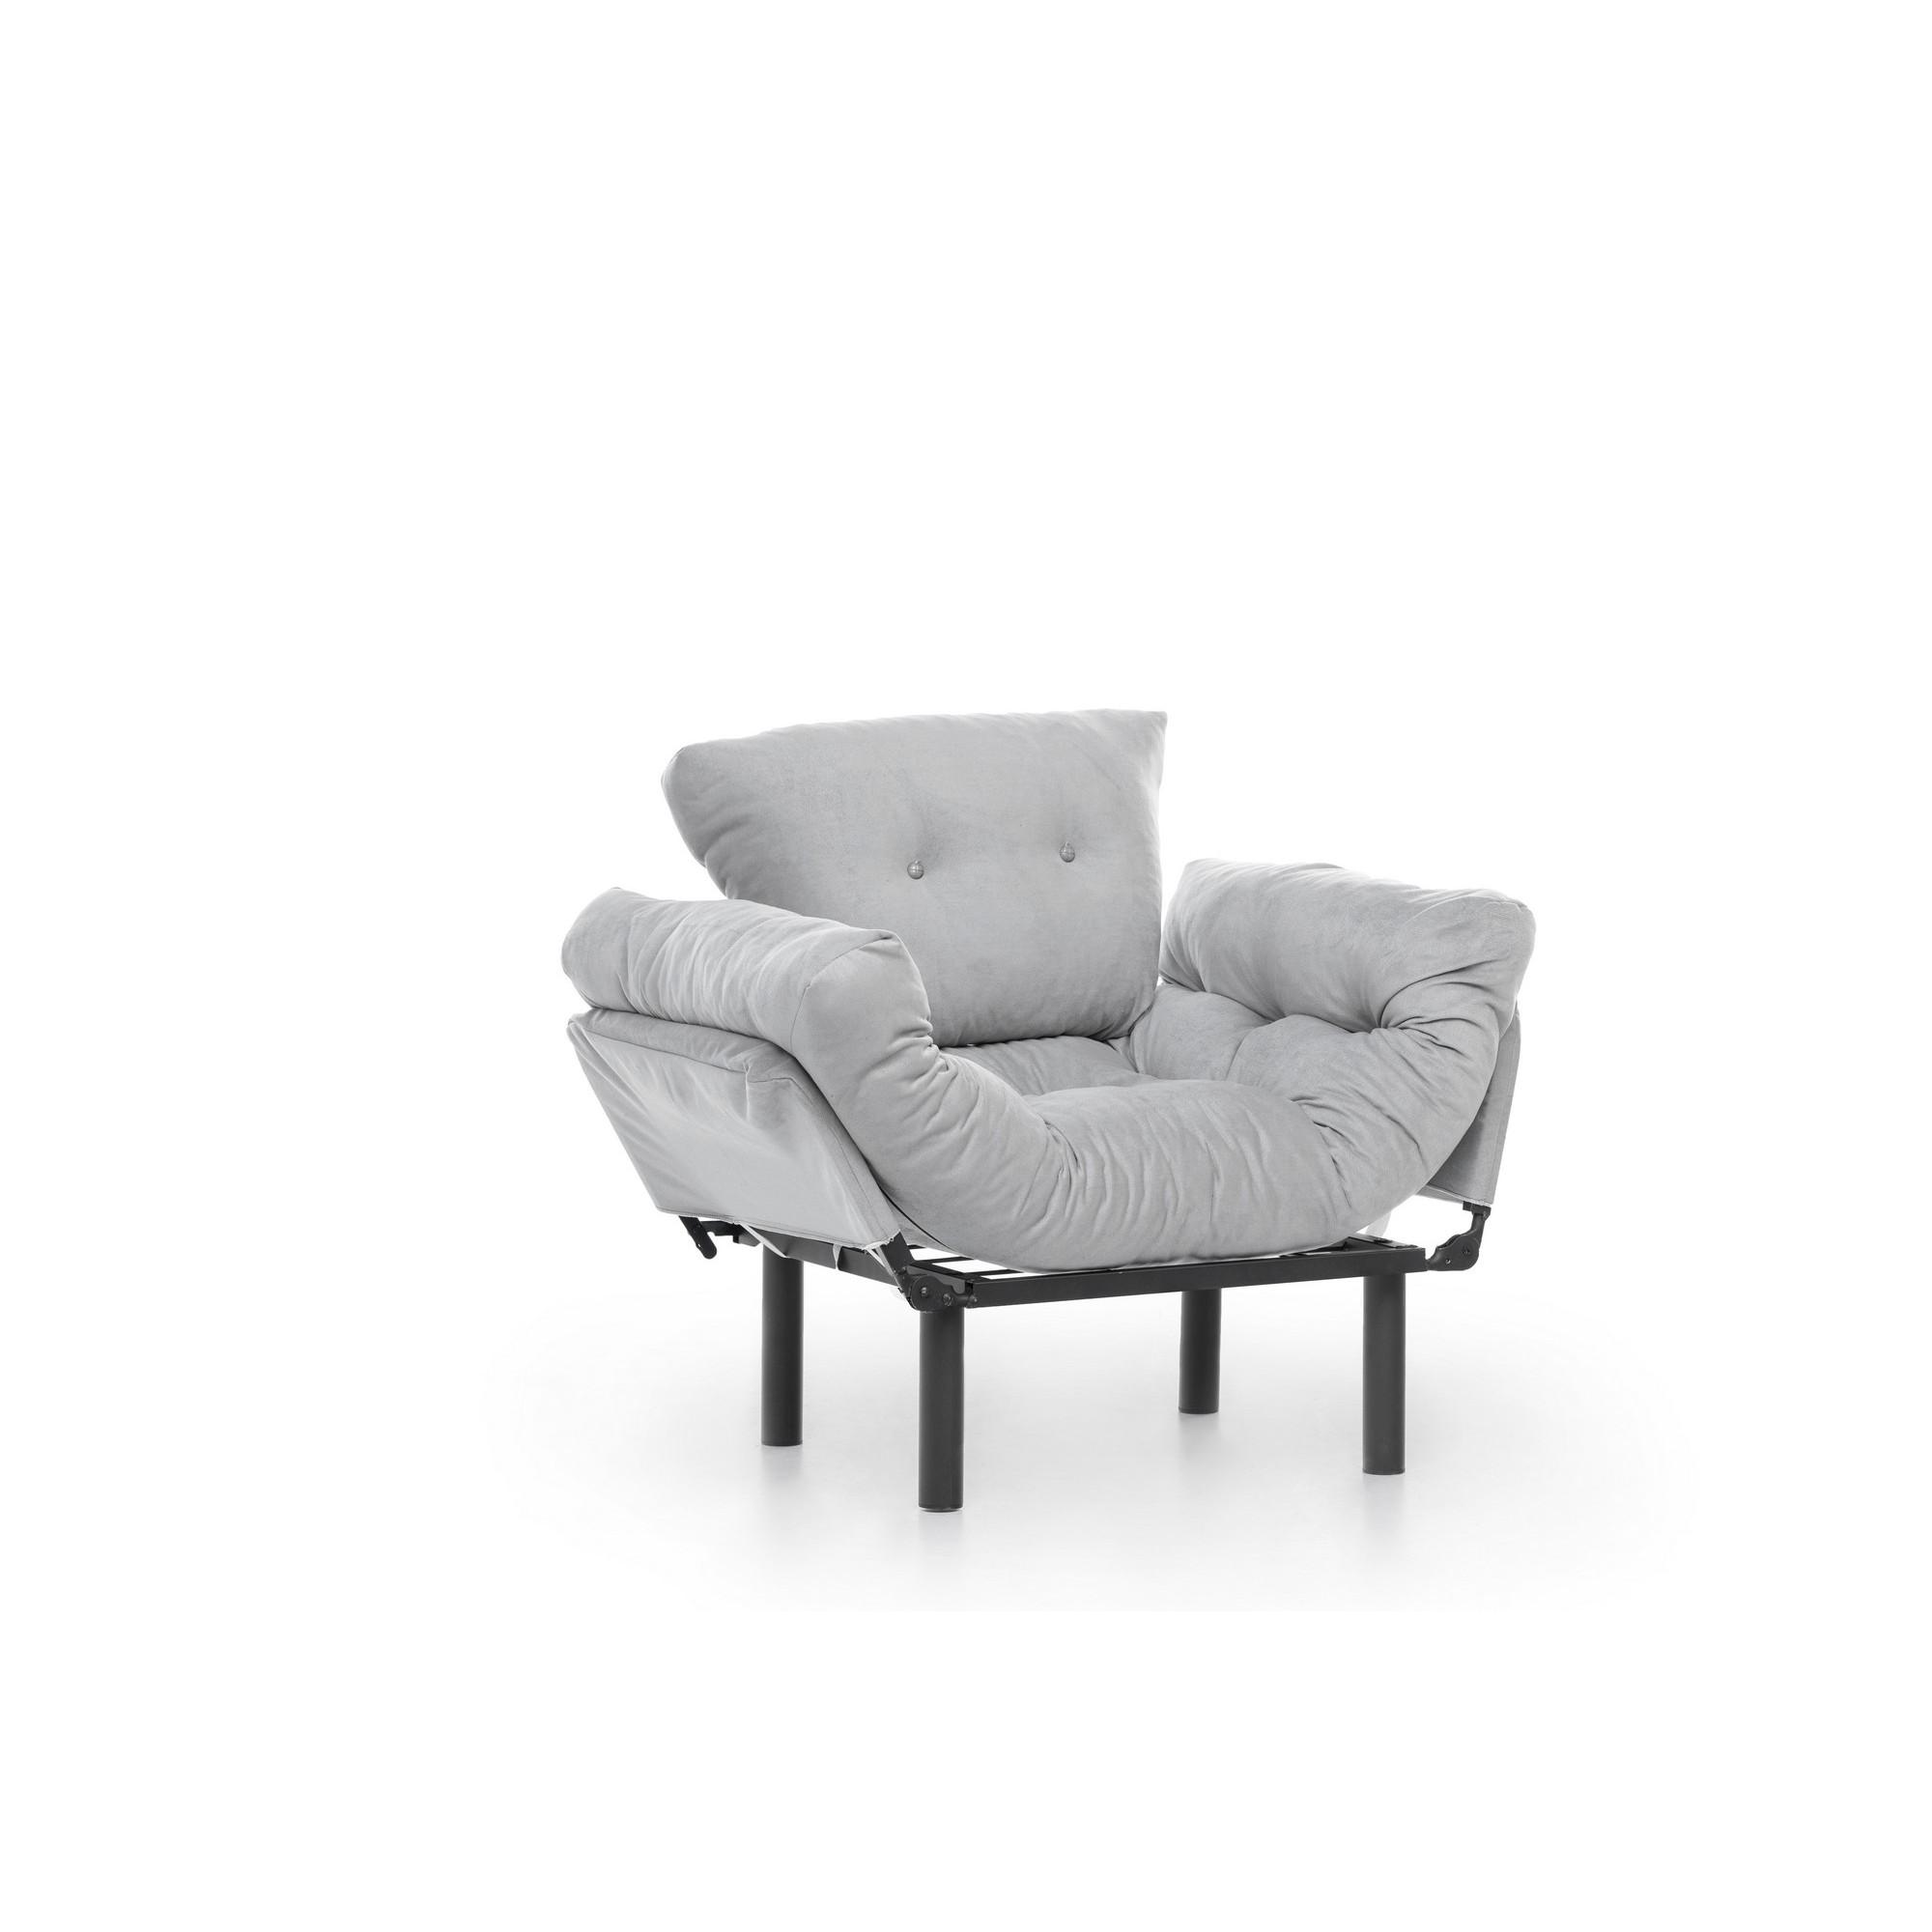 1 Seater Sofa Bed Nitta | Grey